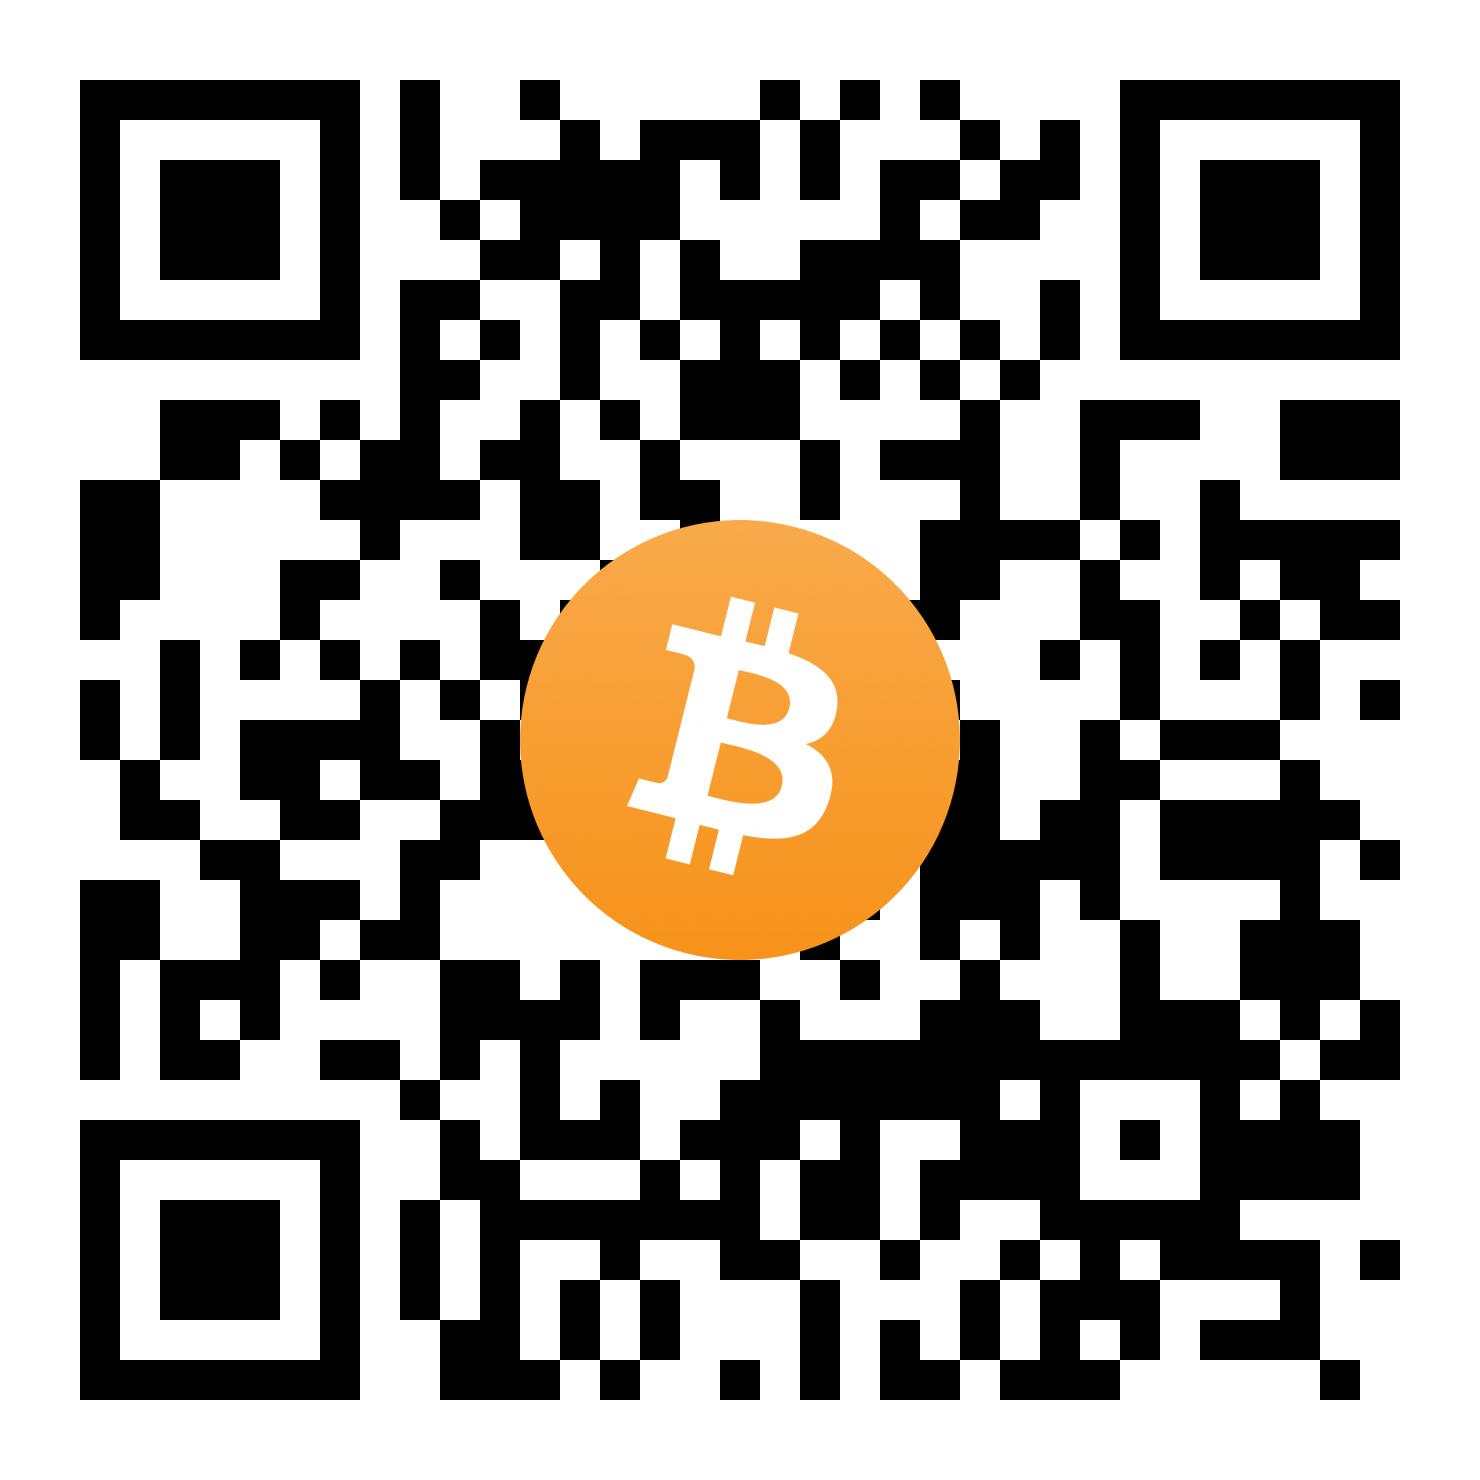 bitcoin trade on nasdaq